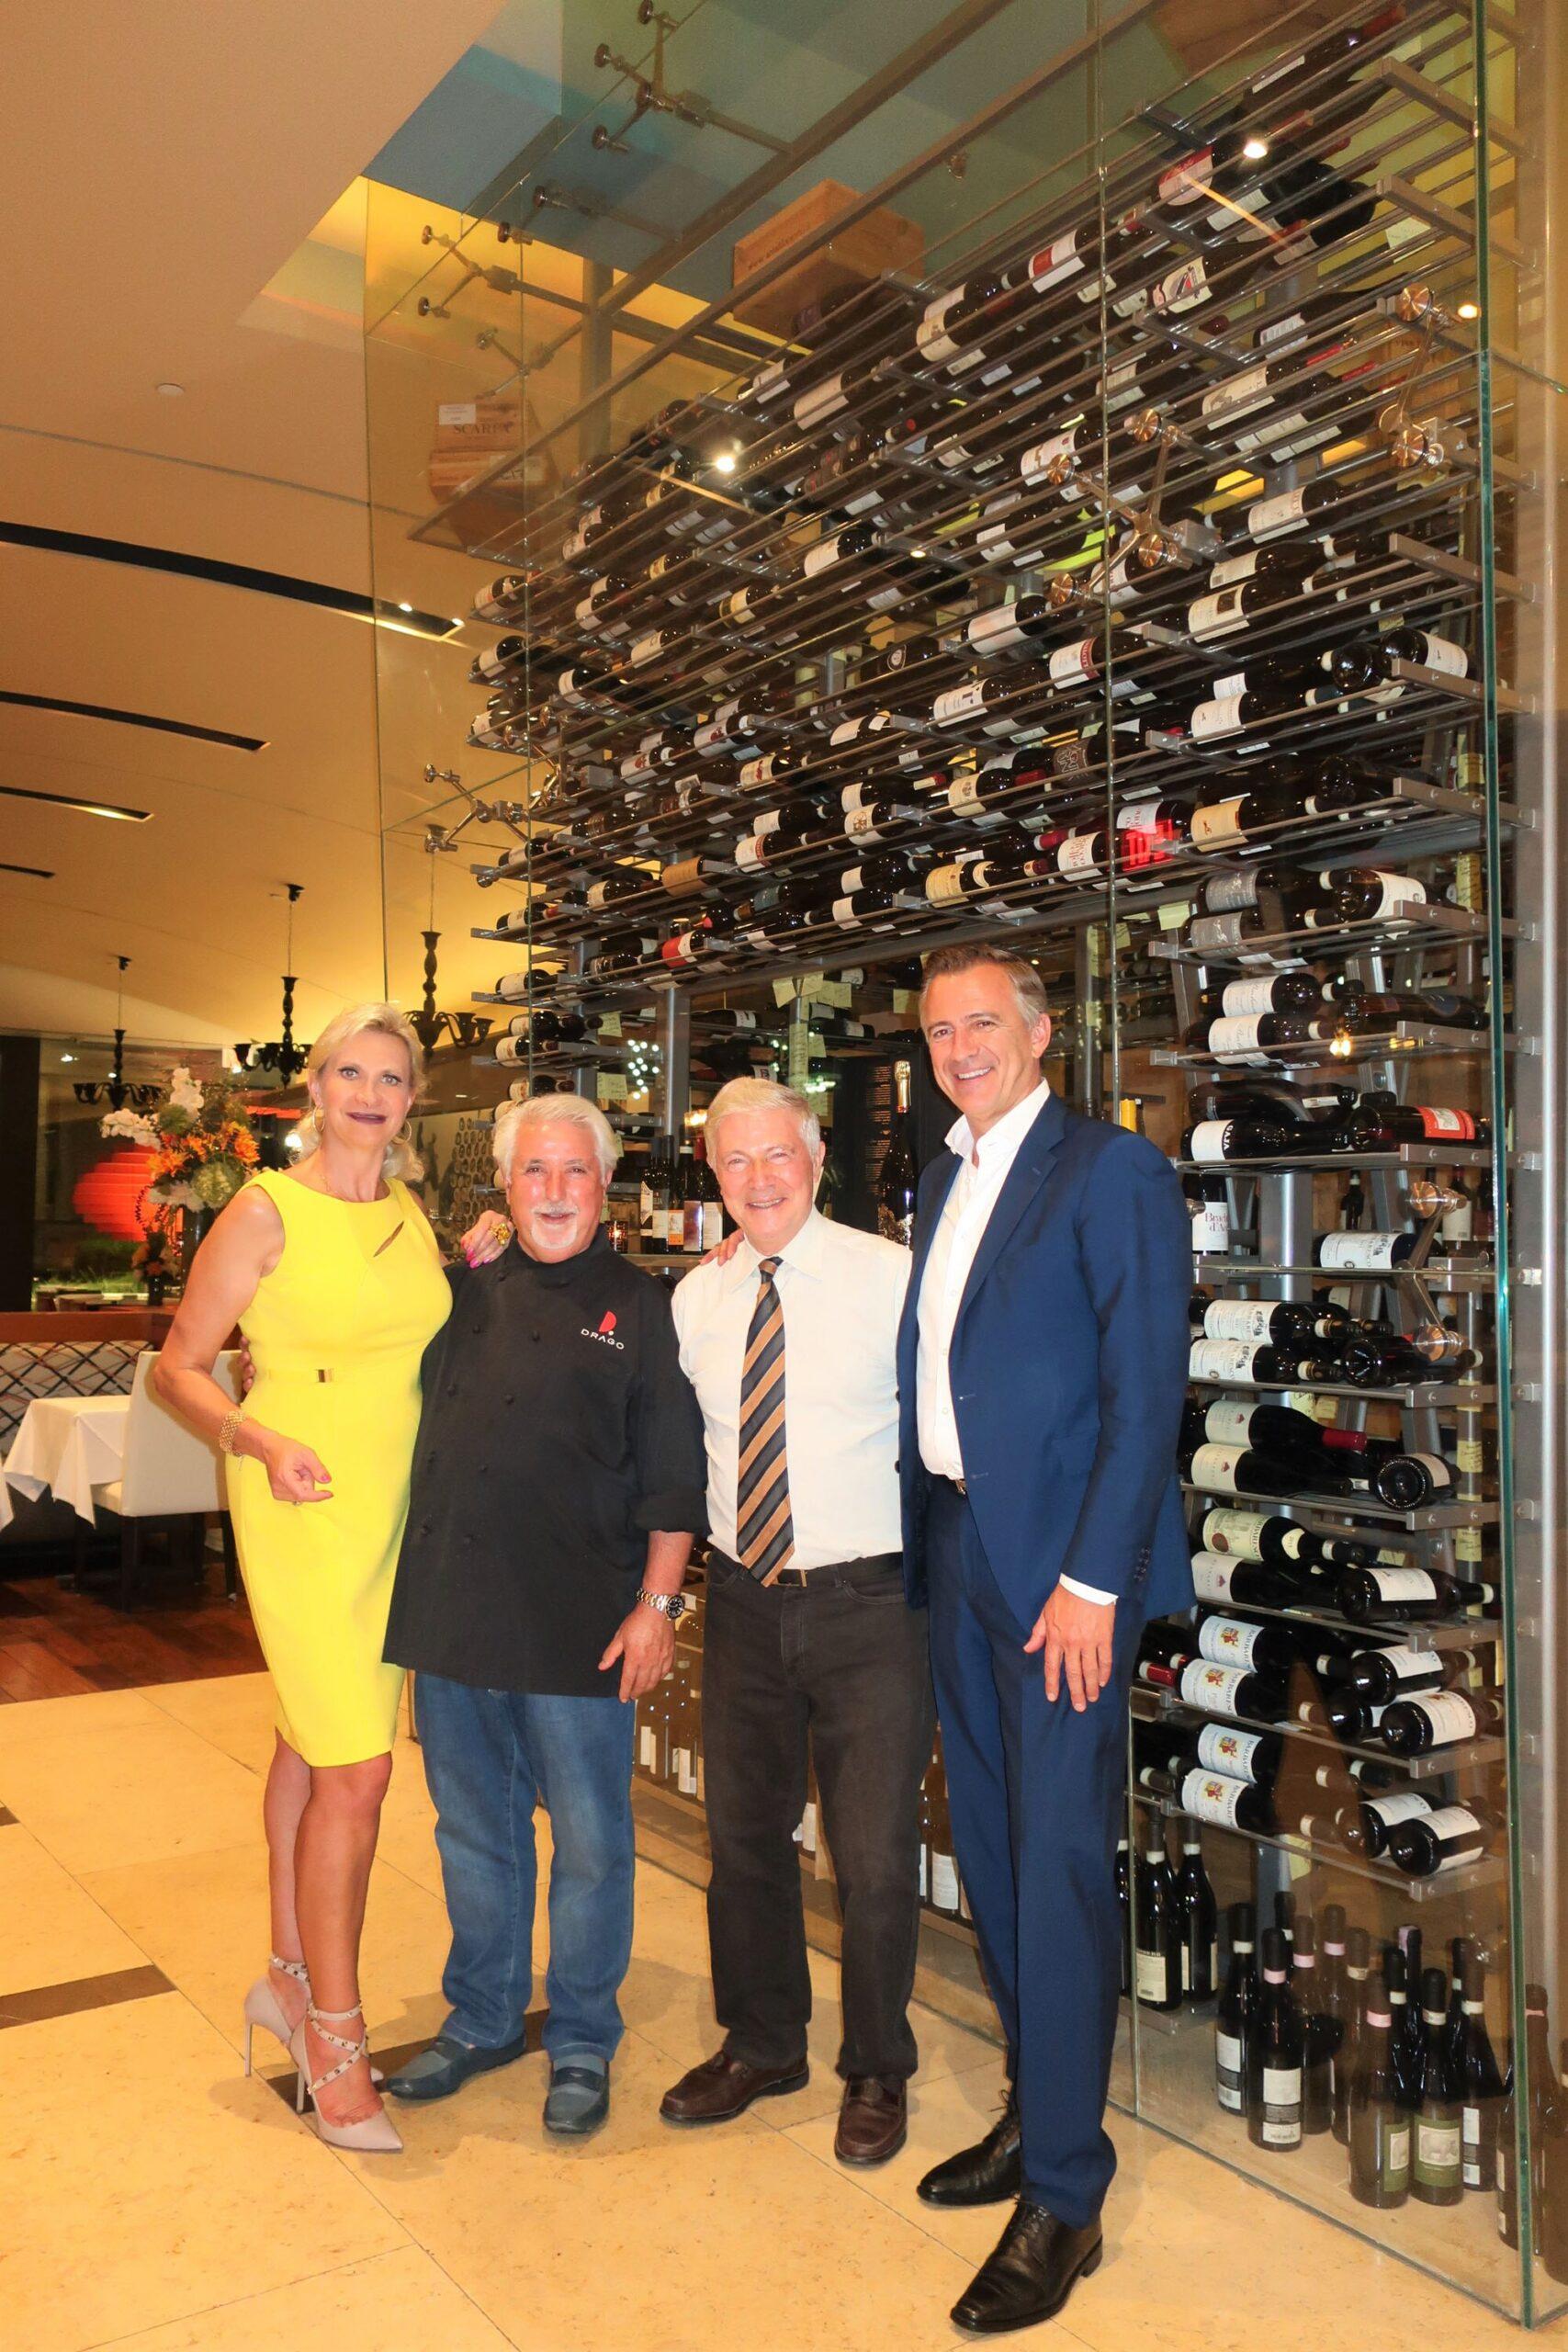 Chef Celestino Drago, Managing partner Piero Selvaggio, GAYOT's Wine & Spirits Editor Dirk Smits, Sophie Gayot